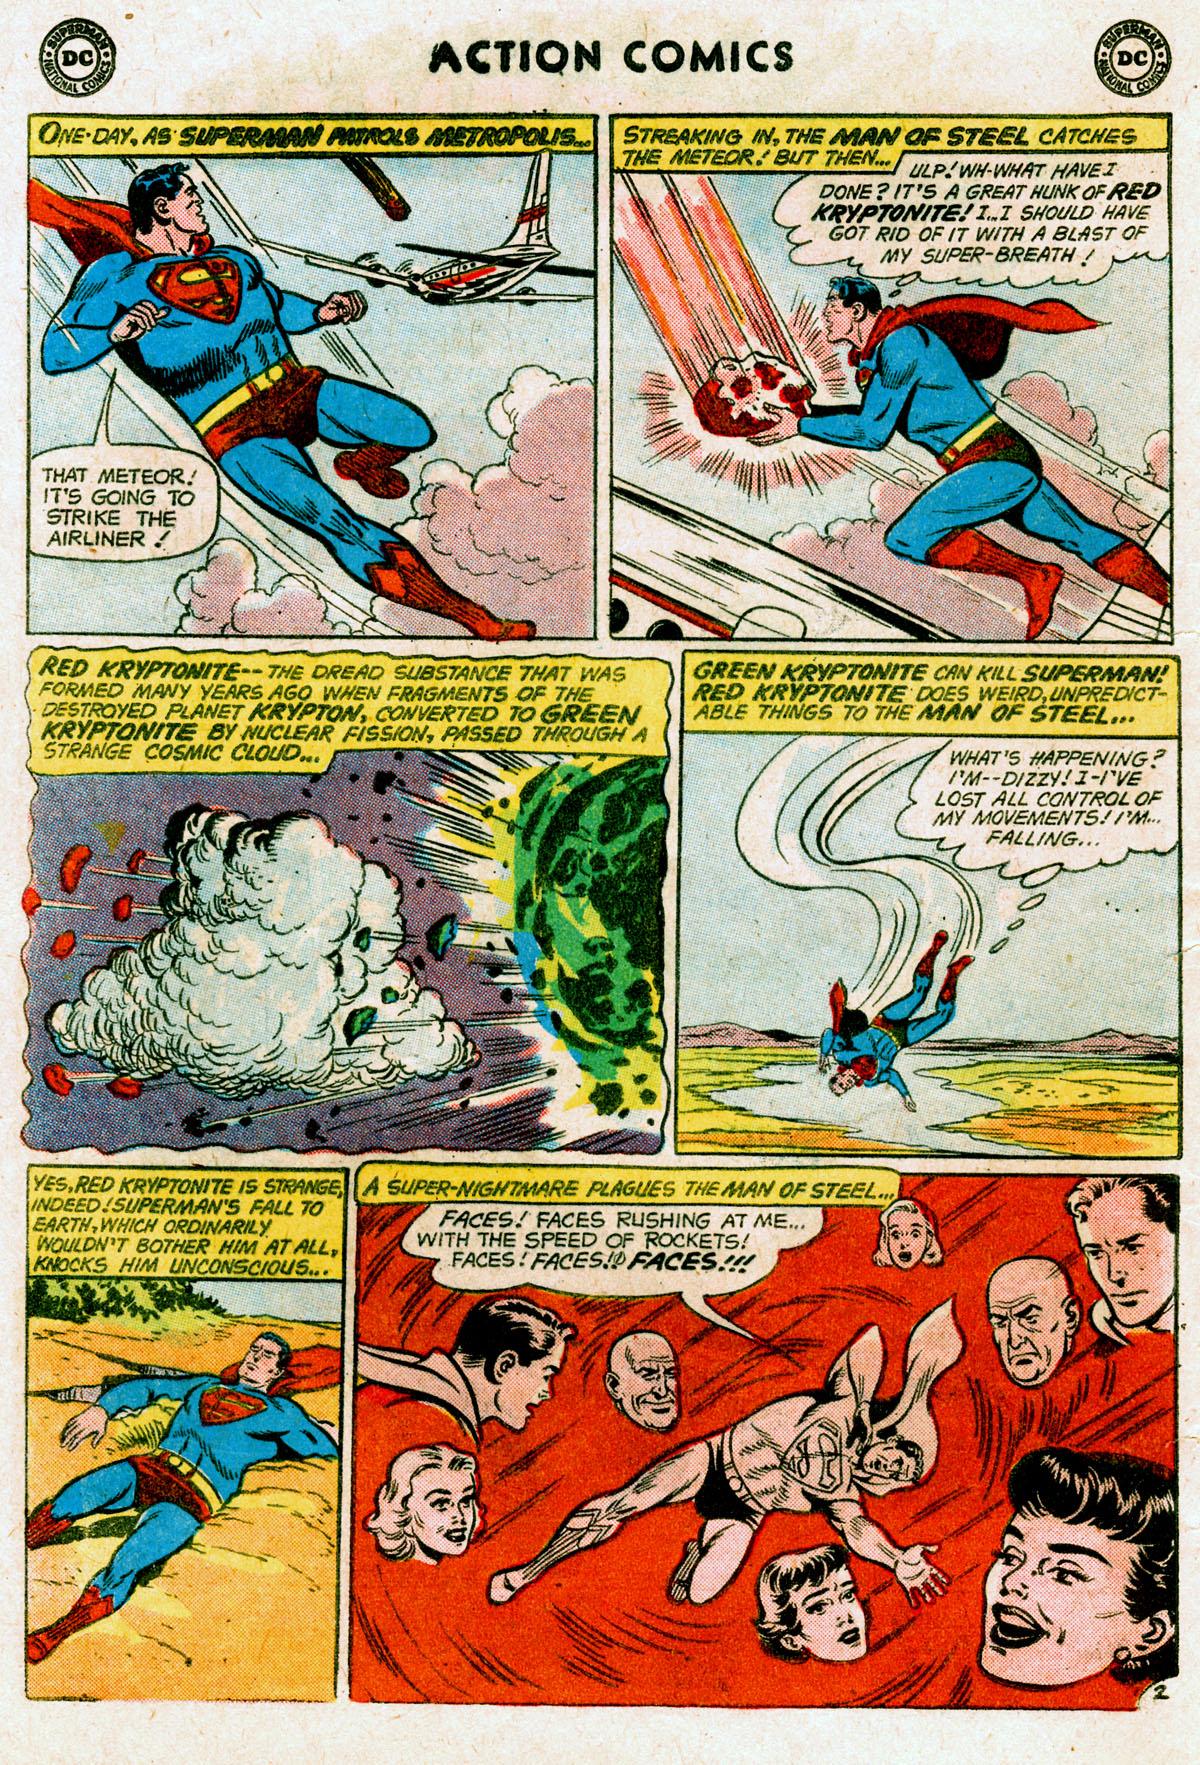 Action Comics (1938) 259 Page 3